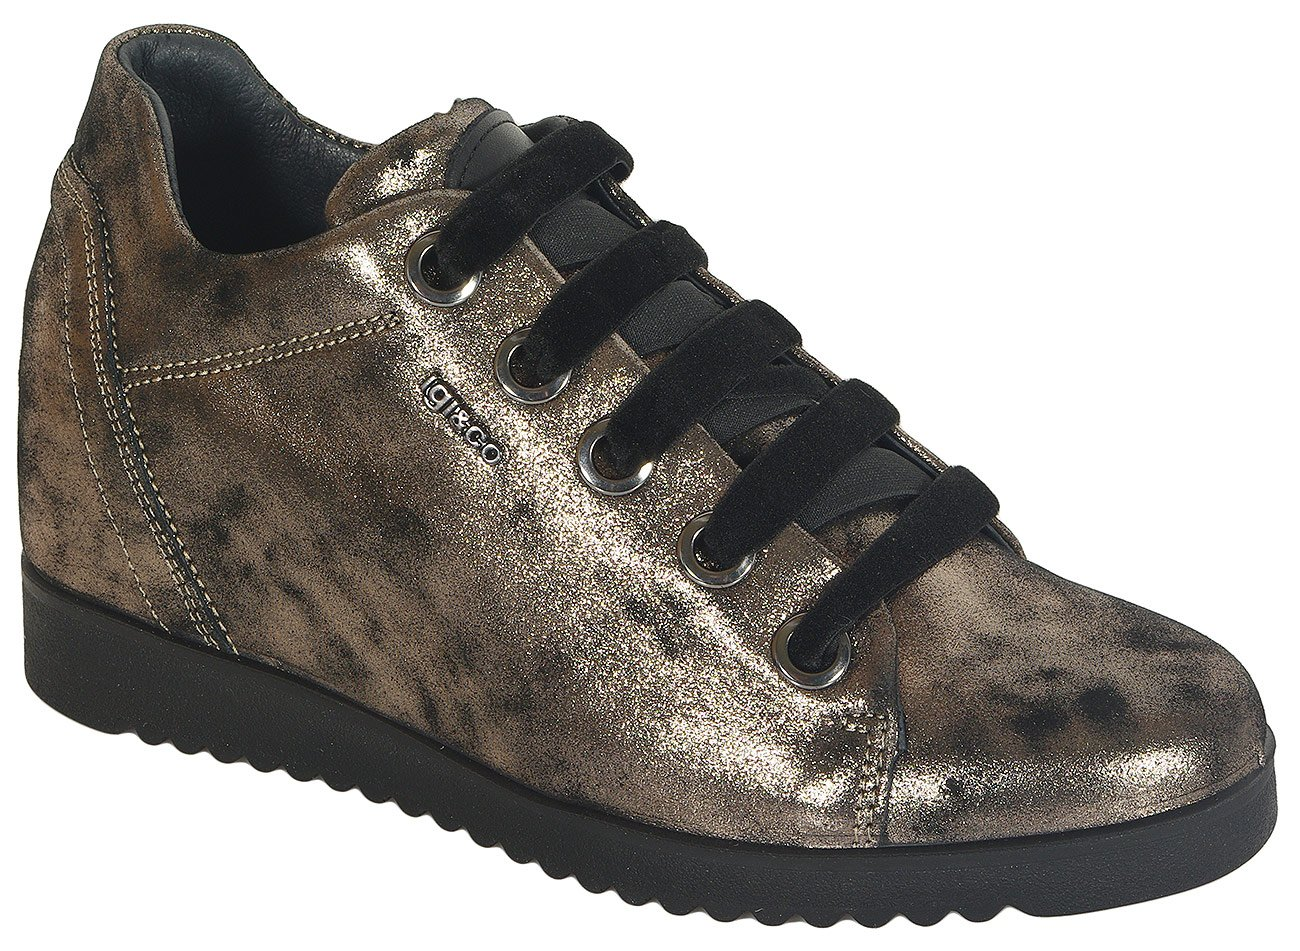 igi&co 41567 sneakers capra perl pyri